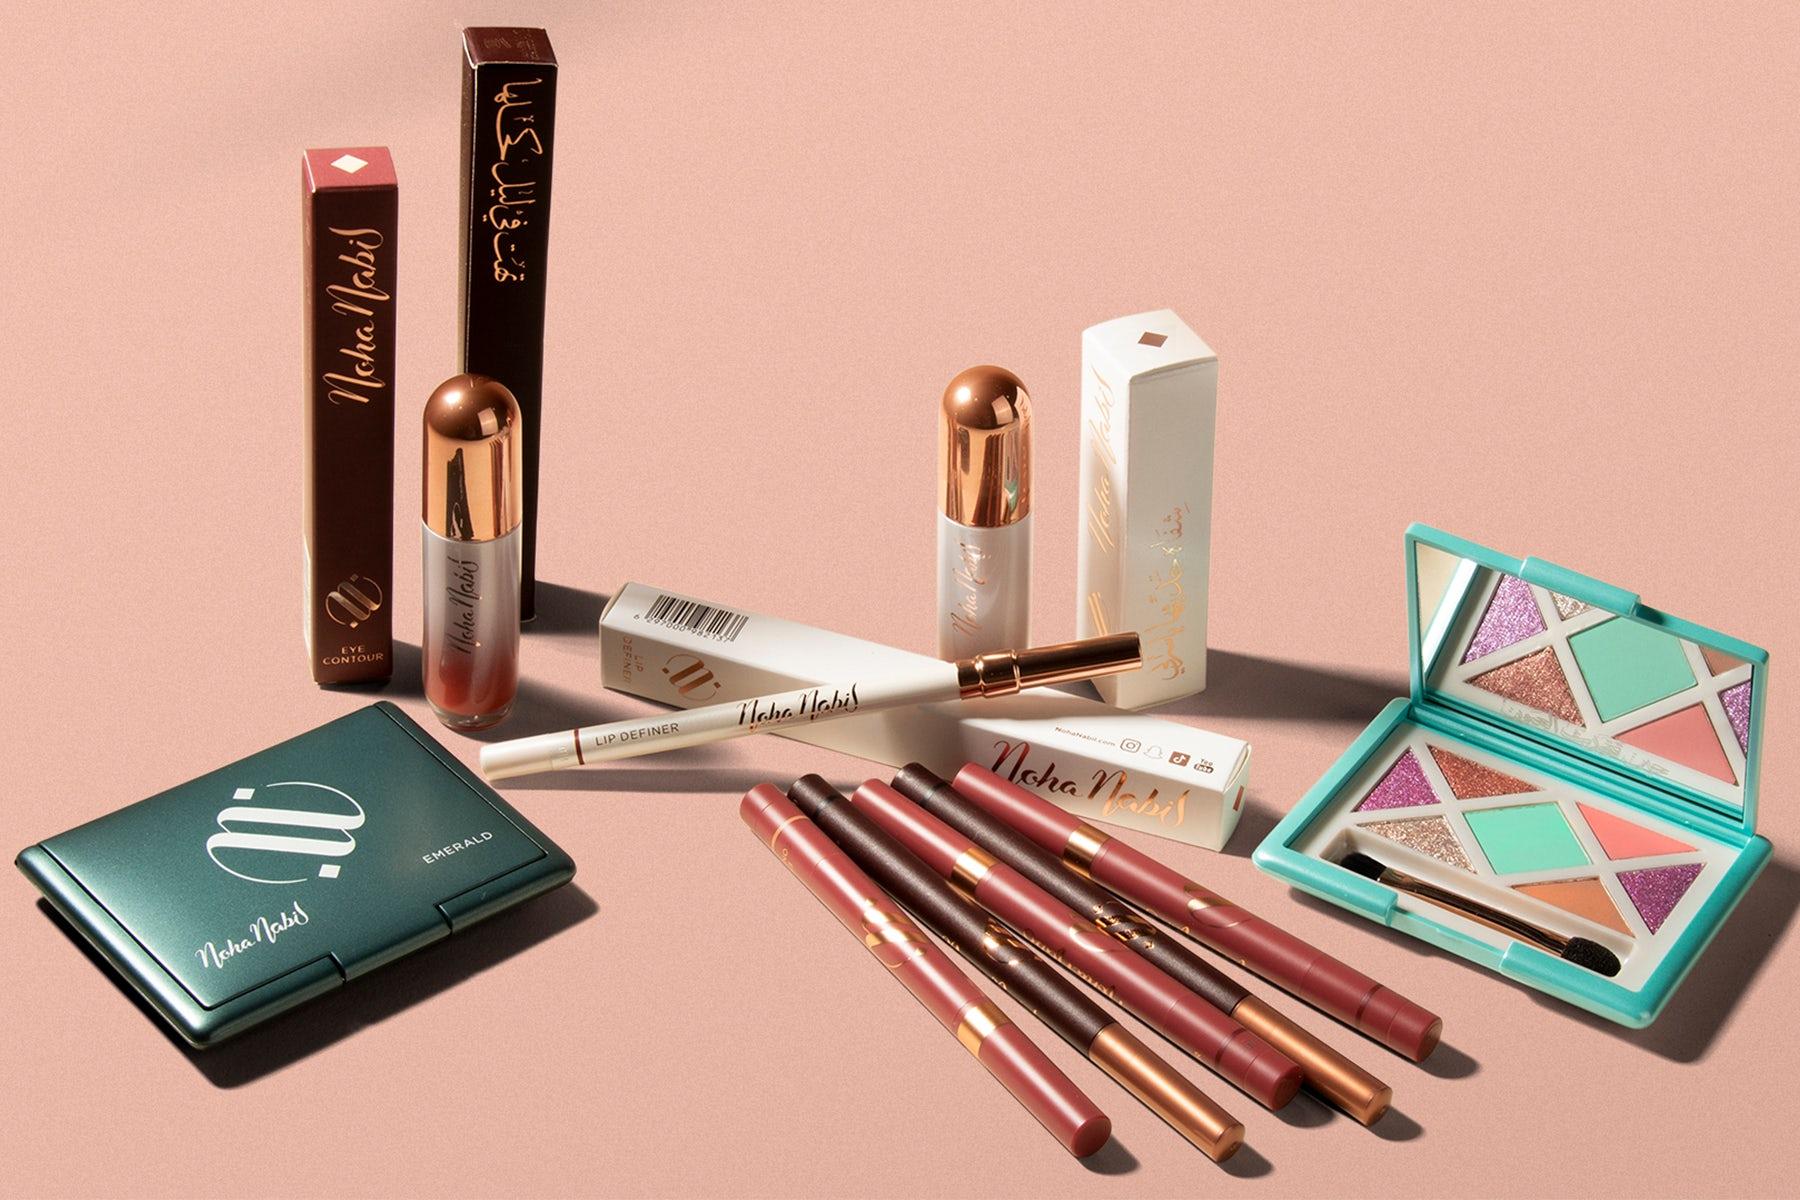 Noha Nabil makeup collection. Noha Nabil.